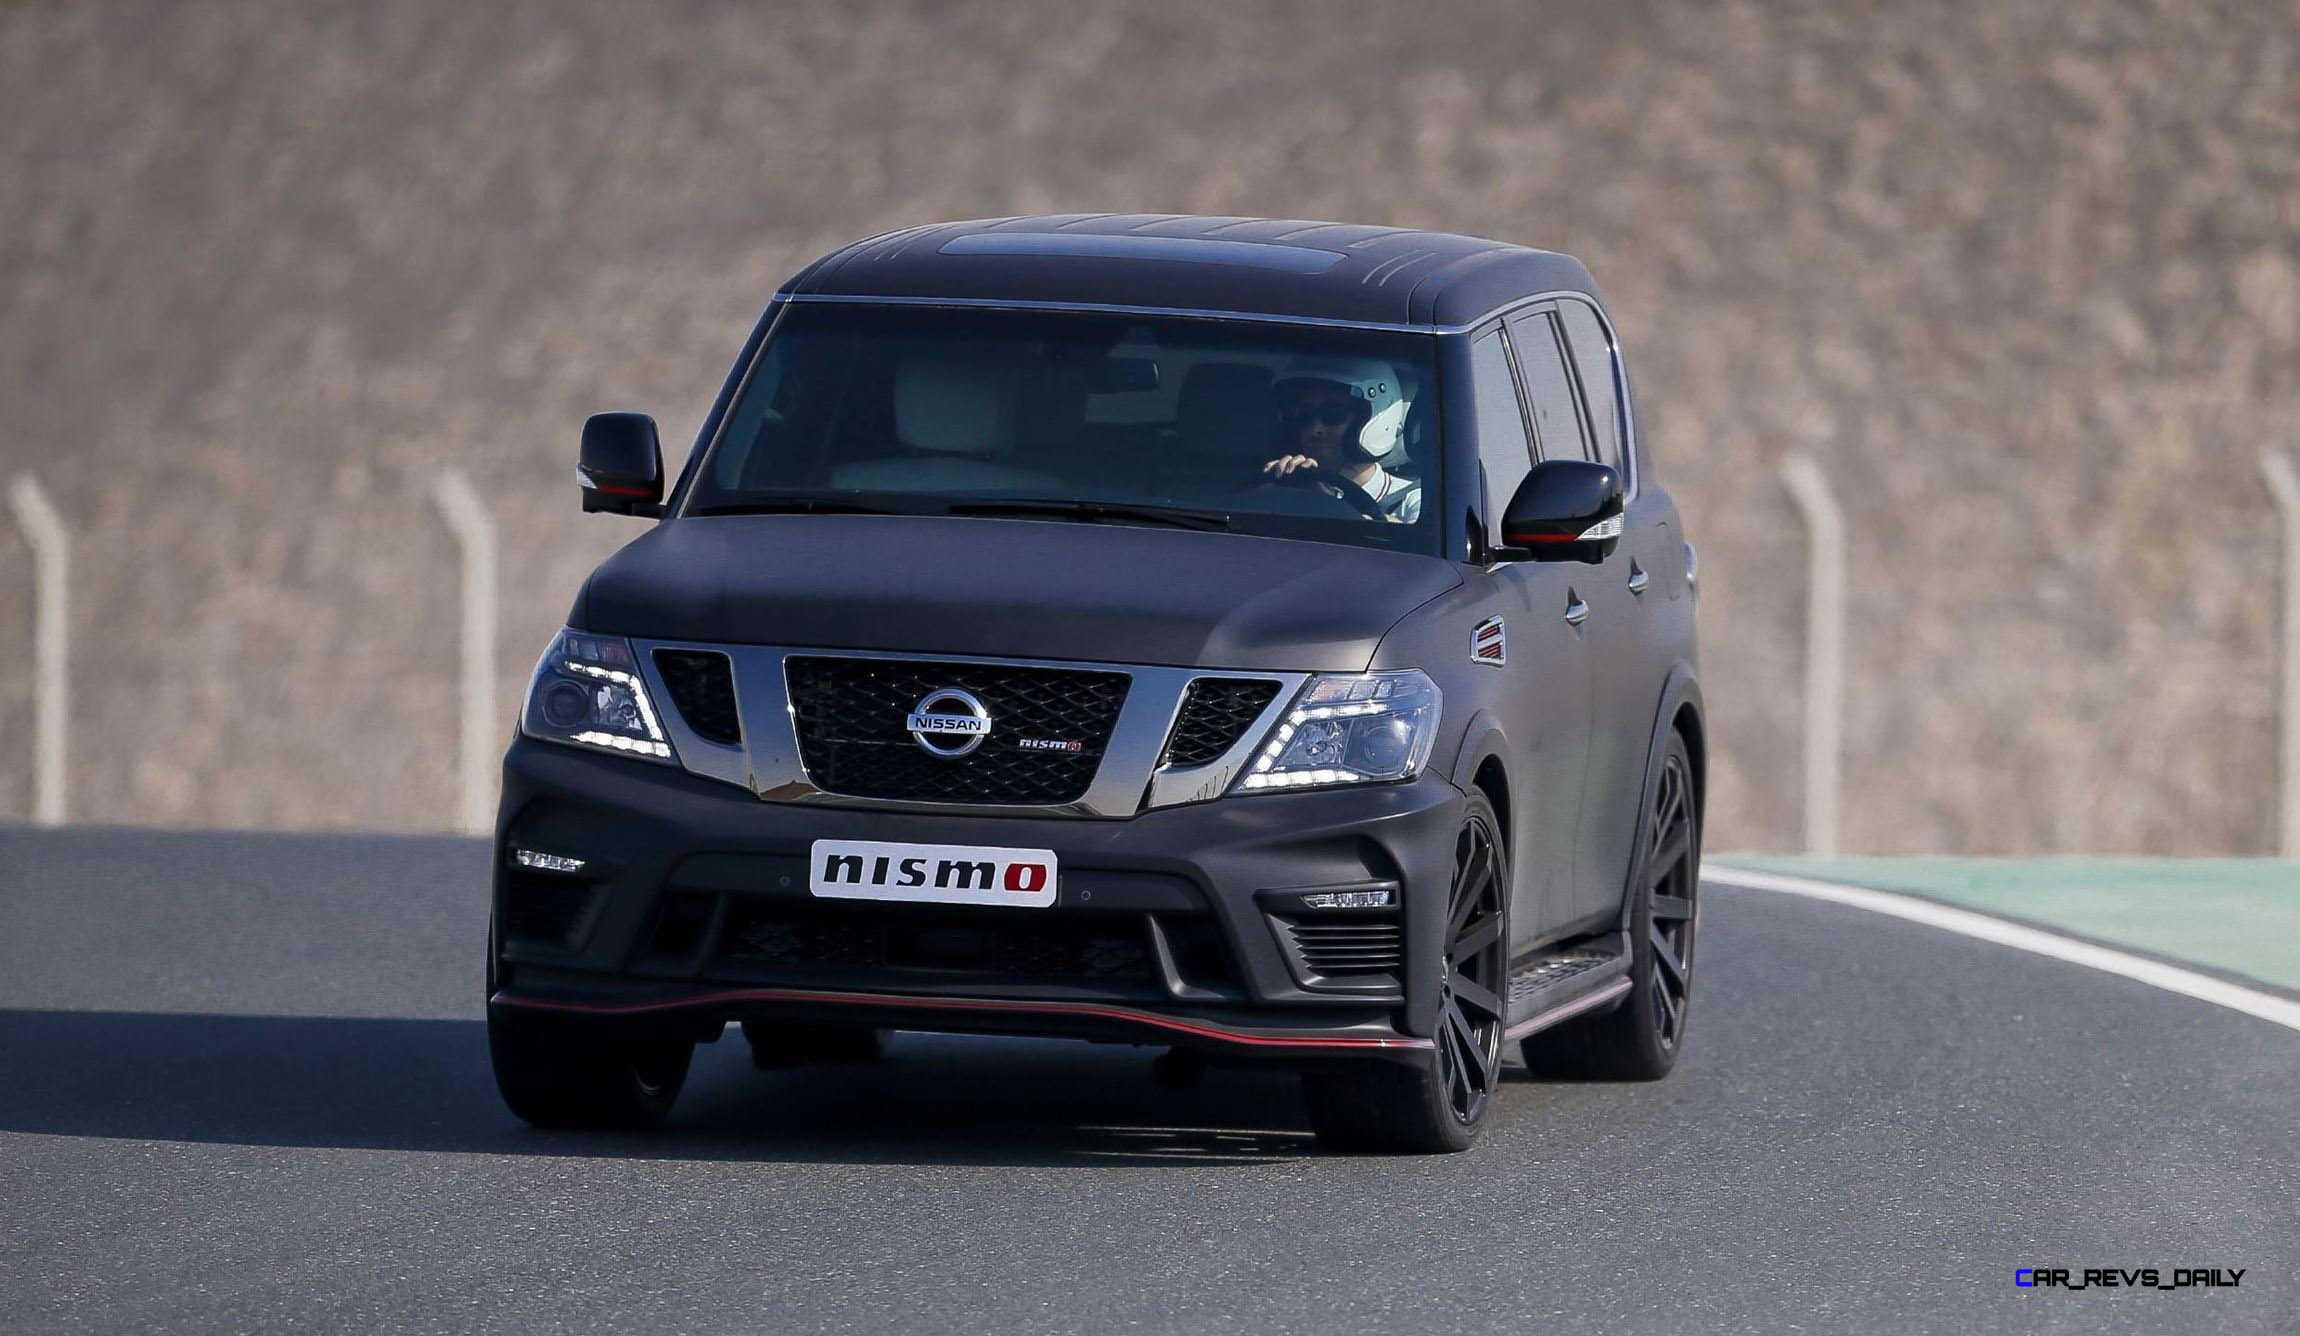 2015 Infiniti Ipl >> 2016 Nissan Patrol NISMO